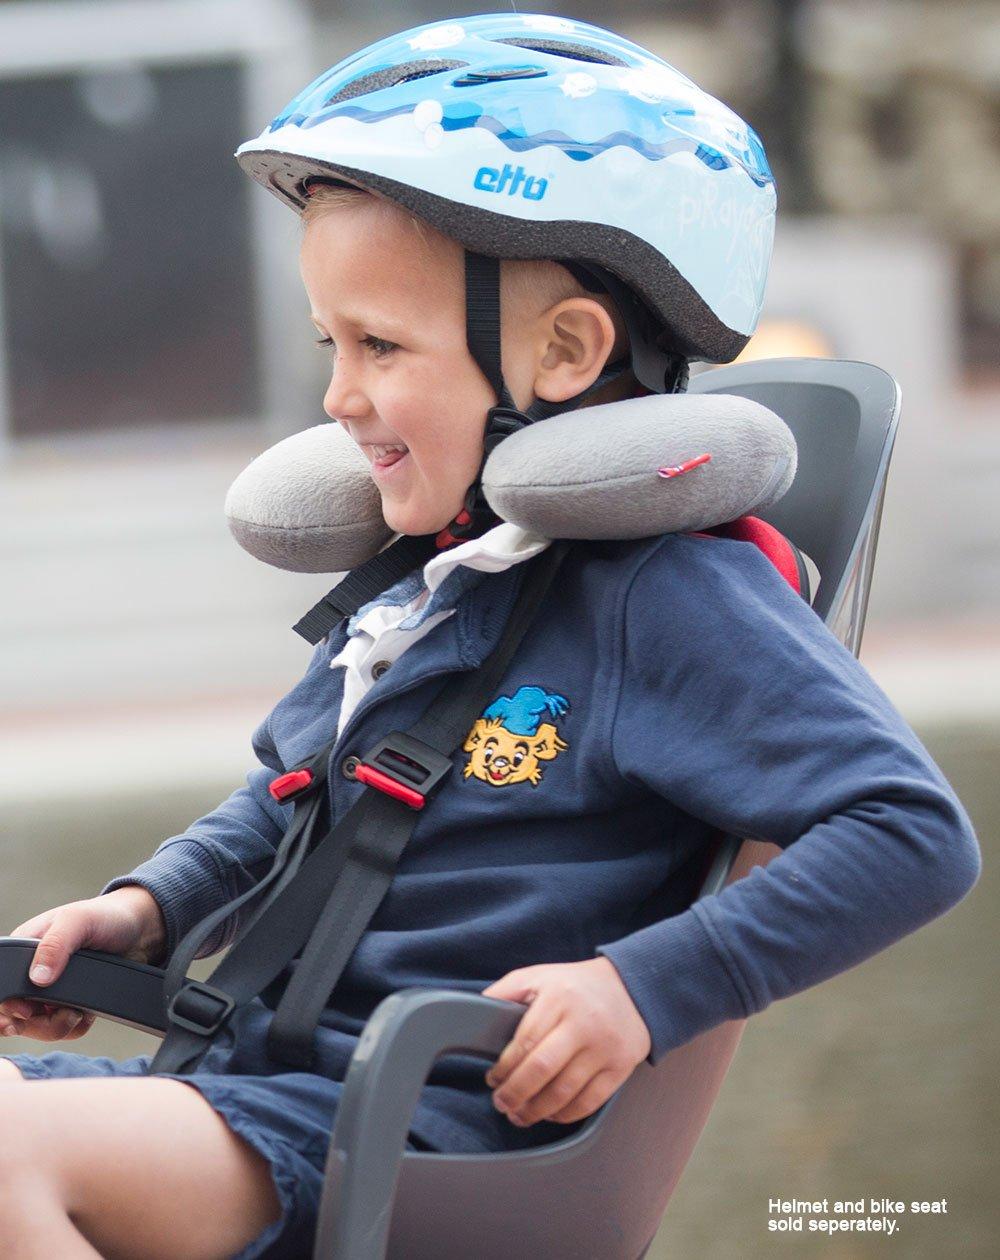 Hamax Neck Cushion – Child Bike Seat Head Support Pillow